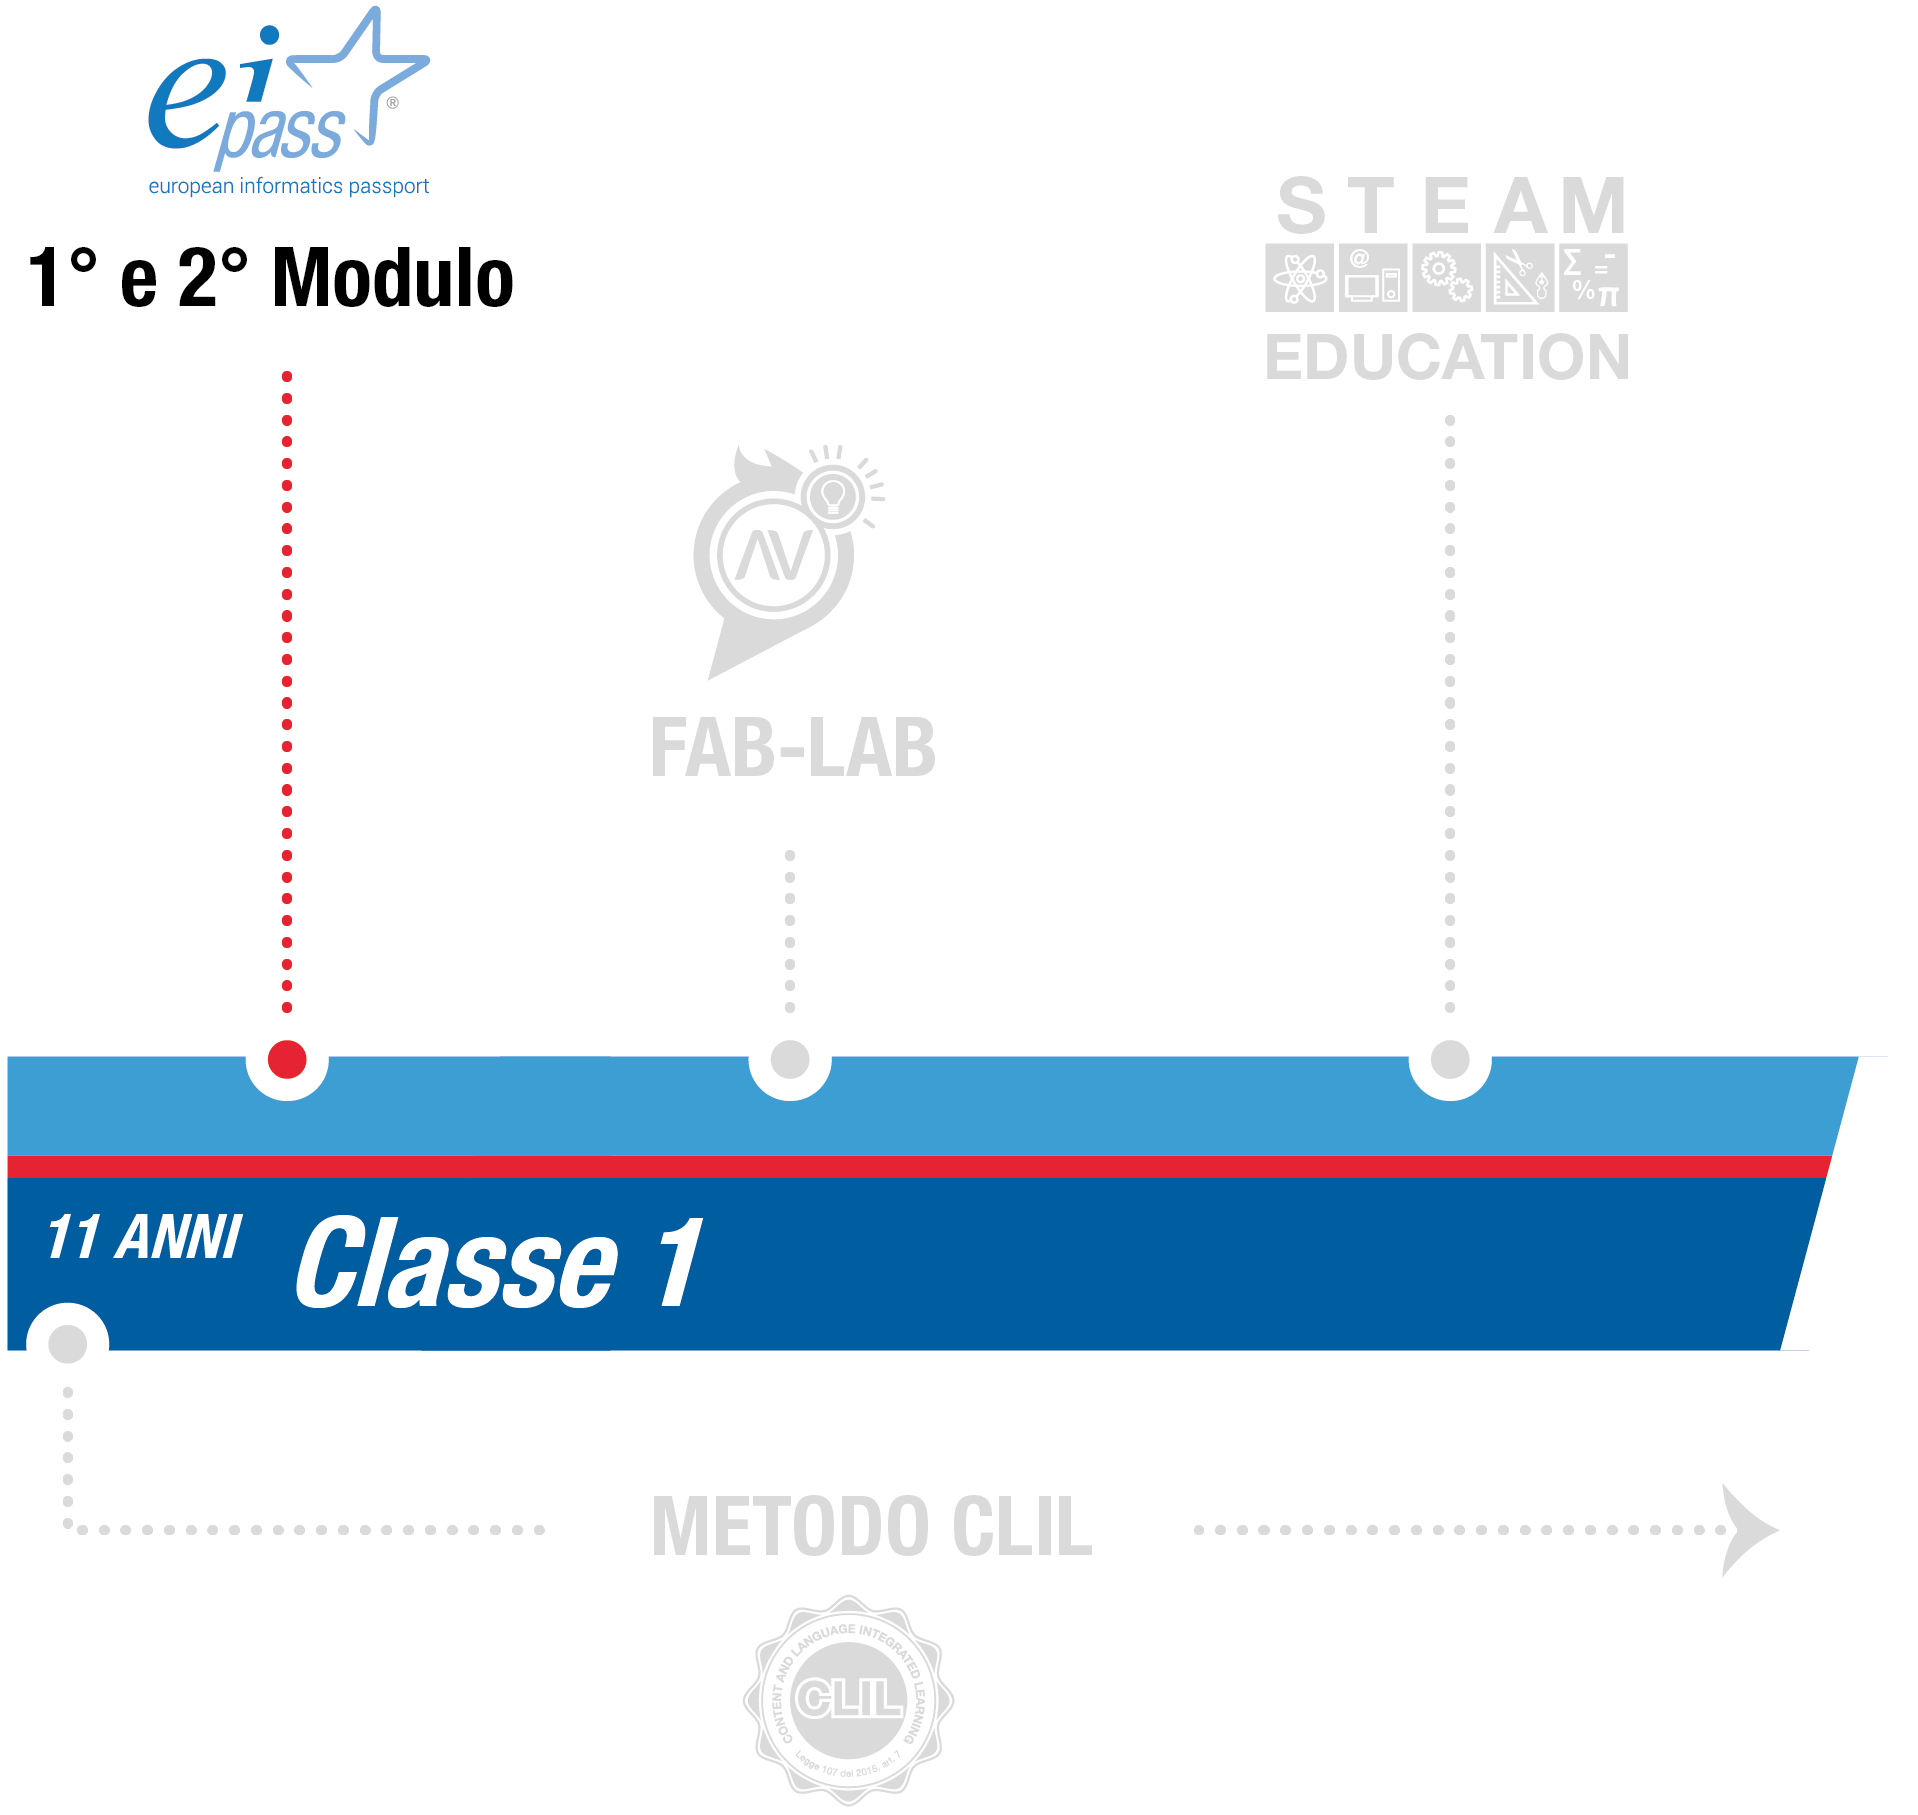 istituto-nobile-middle-school-eipass-1anno